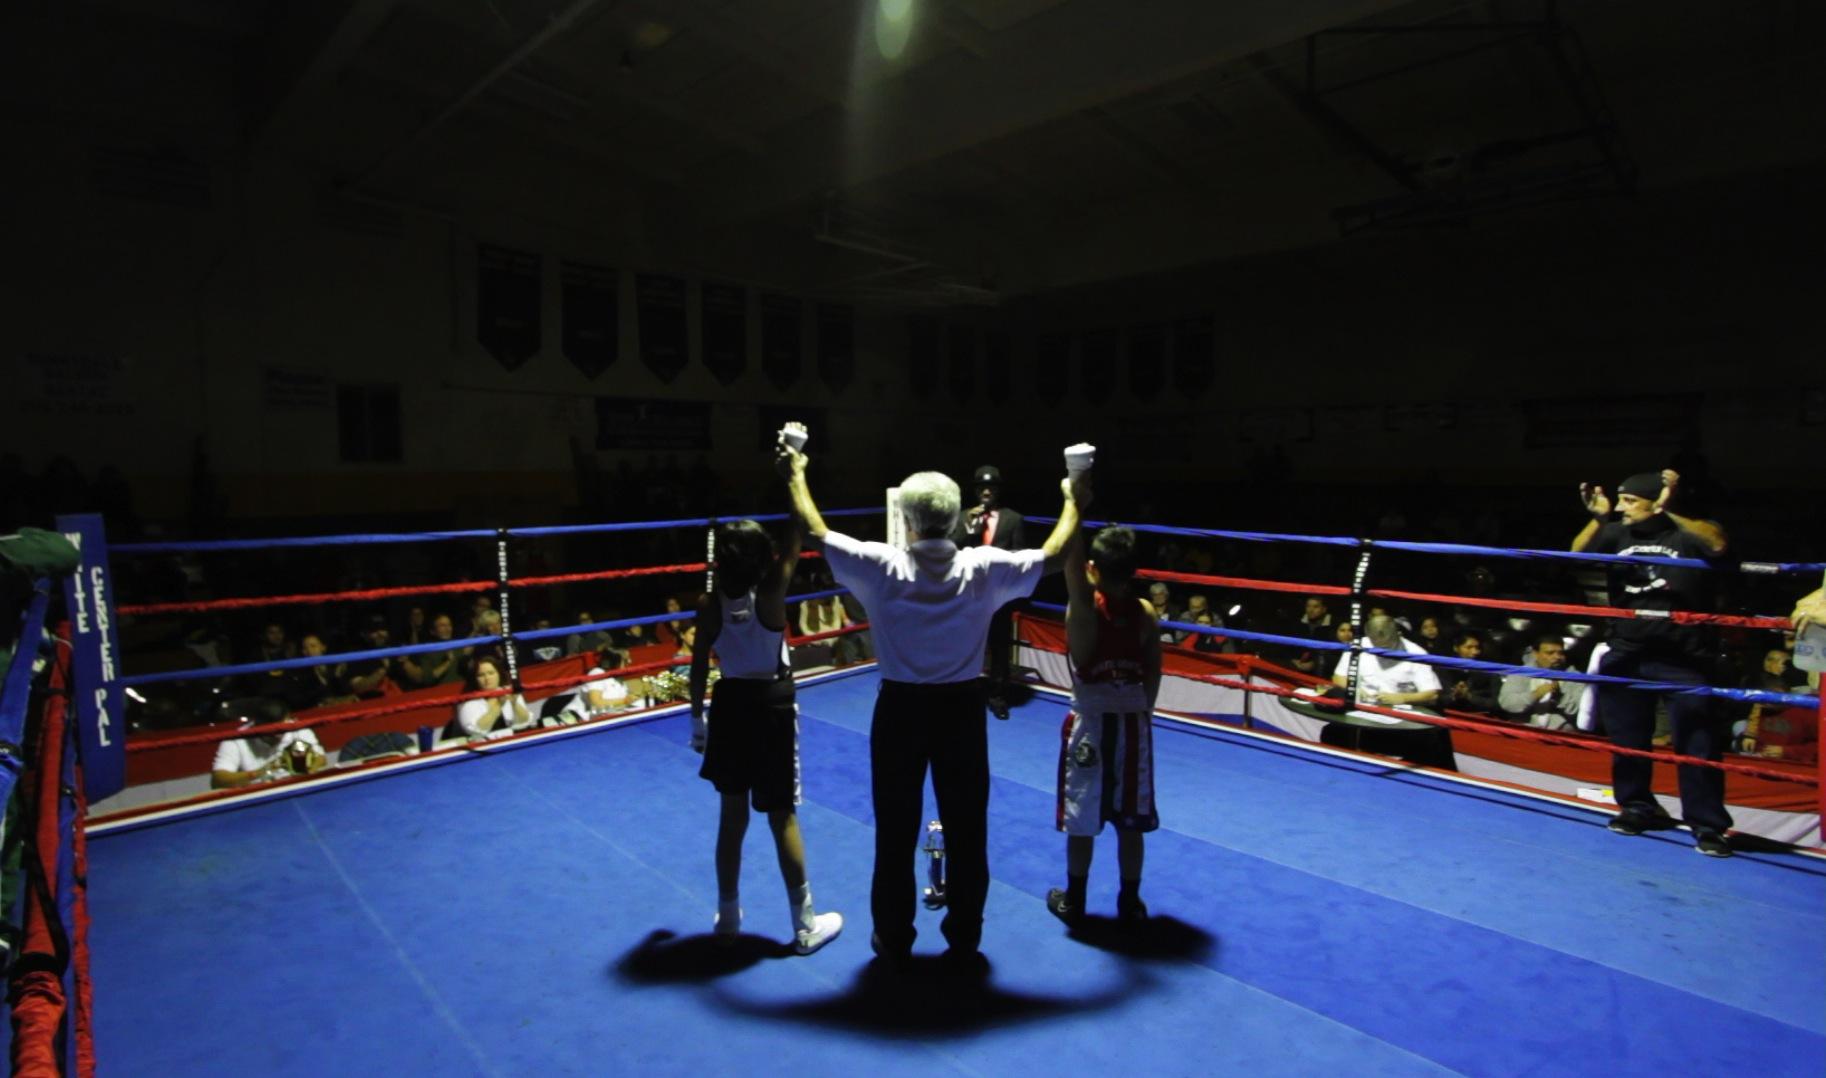 White Center PAL Boxing Gym